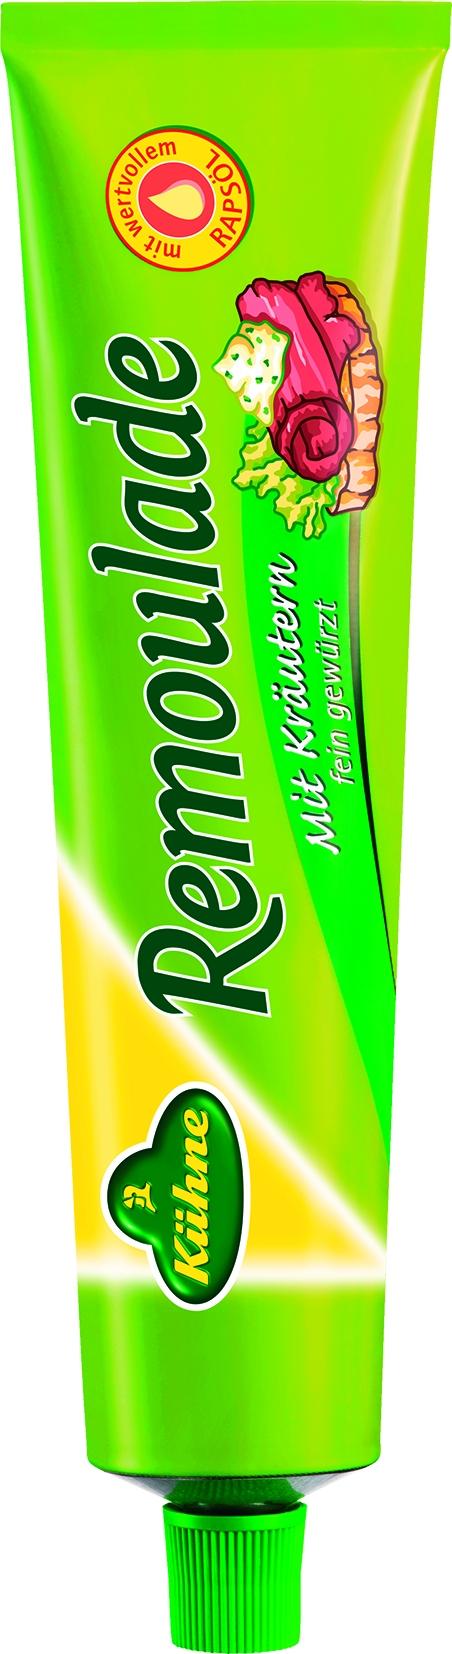 Kraeuter-Remoulade